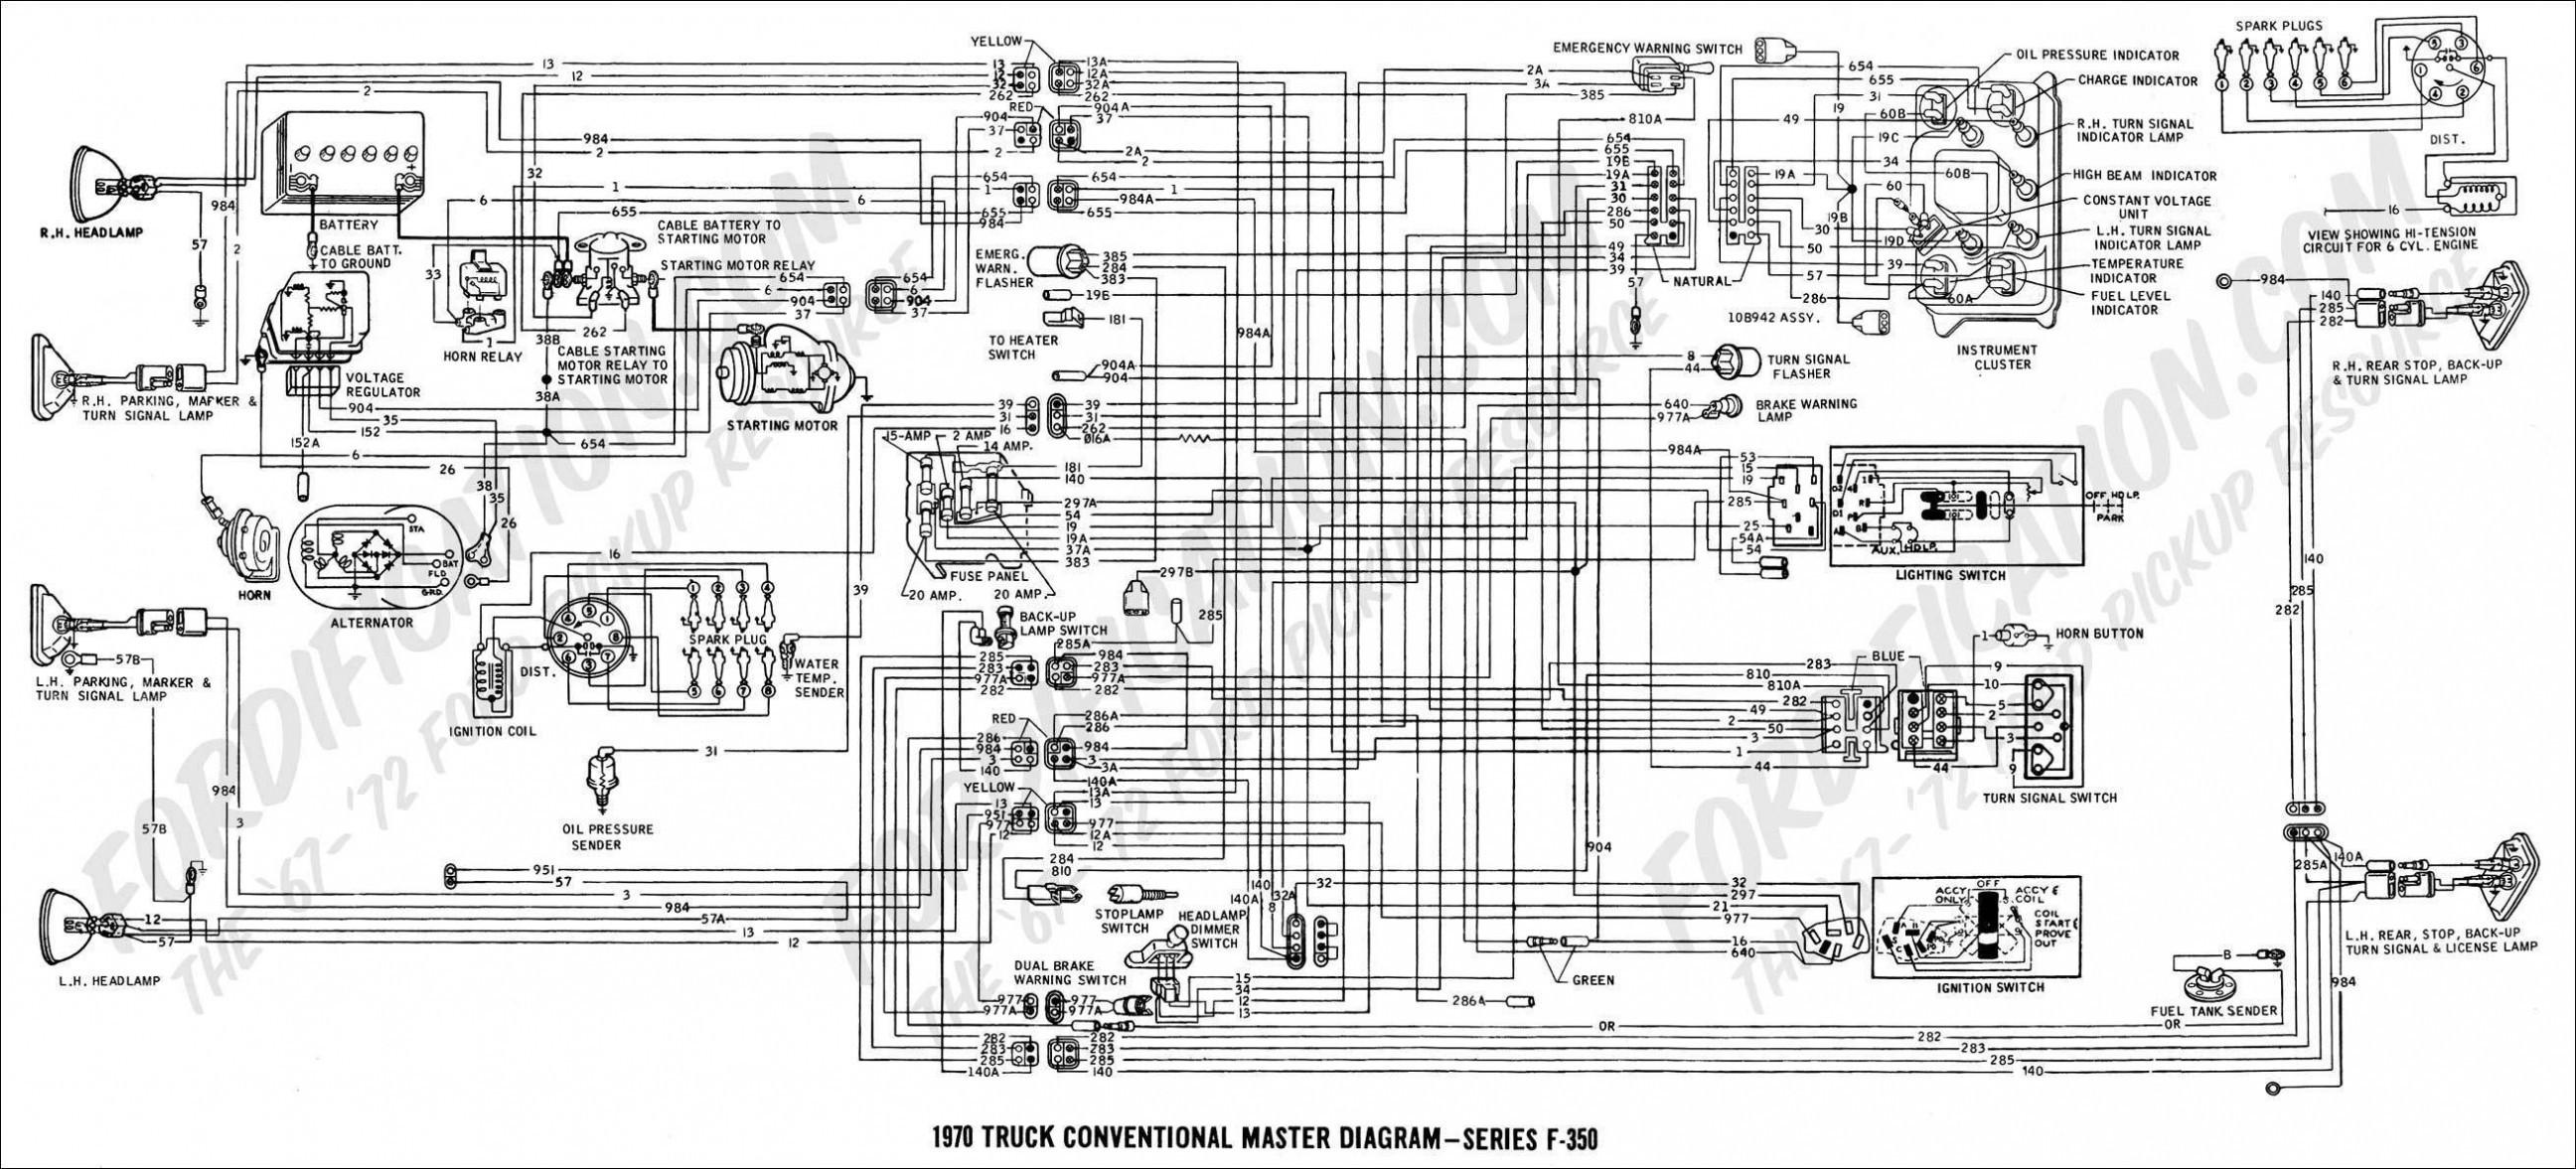 2011 F350 Upfitter Wire Diagram Inspirational | Wiring ...